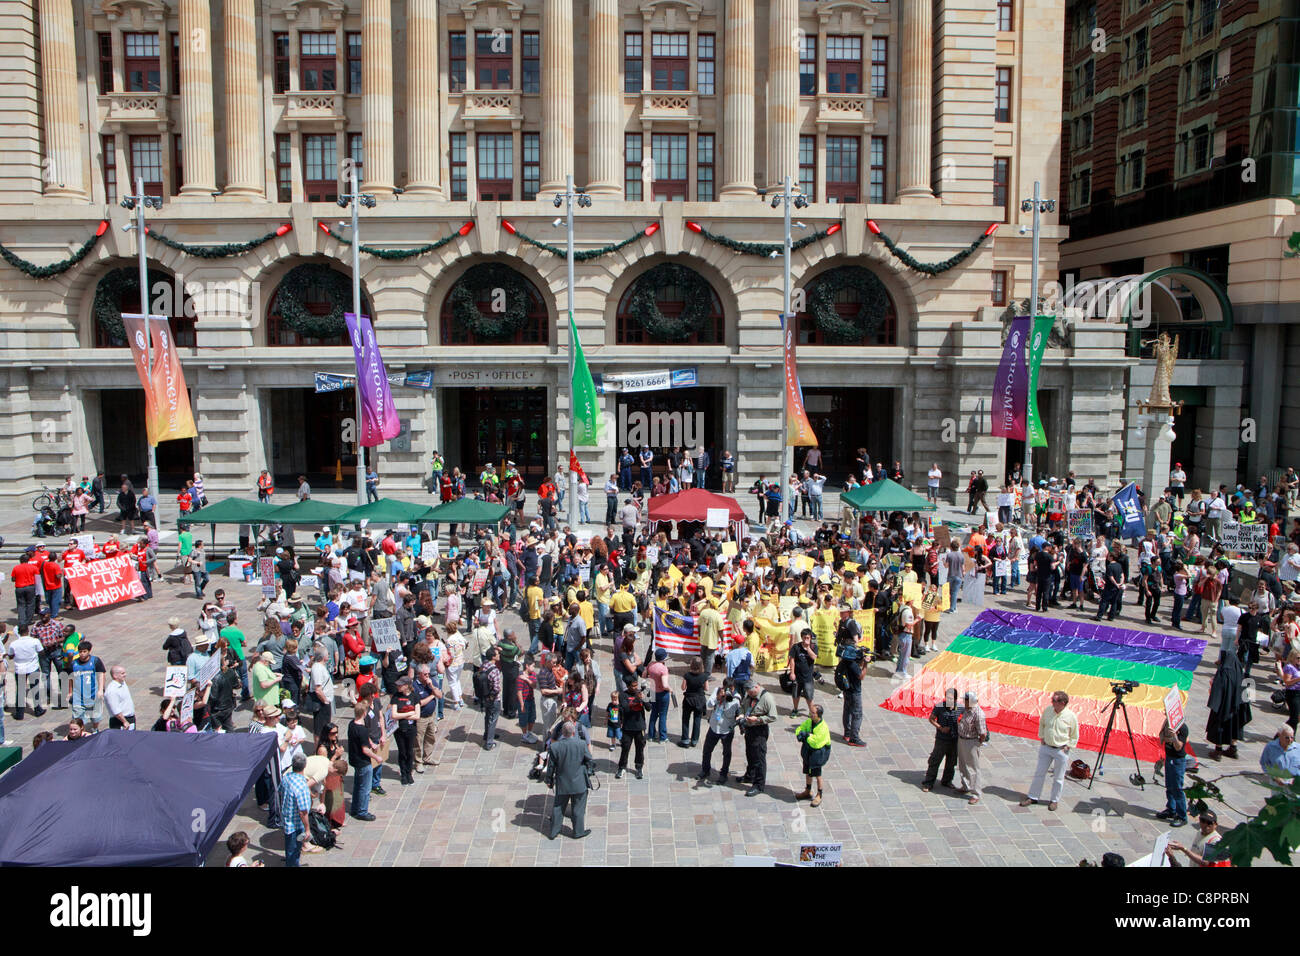 Ocupar Perth protesta coincide con el inicio del CHOGM 2011. Perth, Australia Occidental. Imagen De Stock